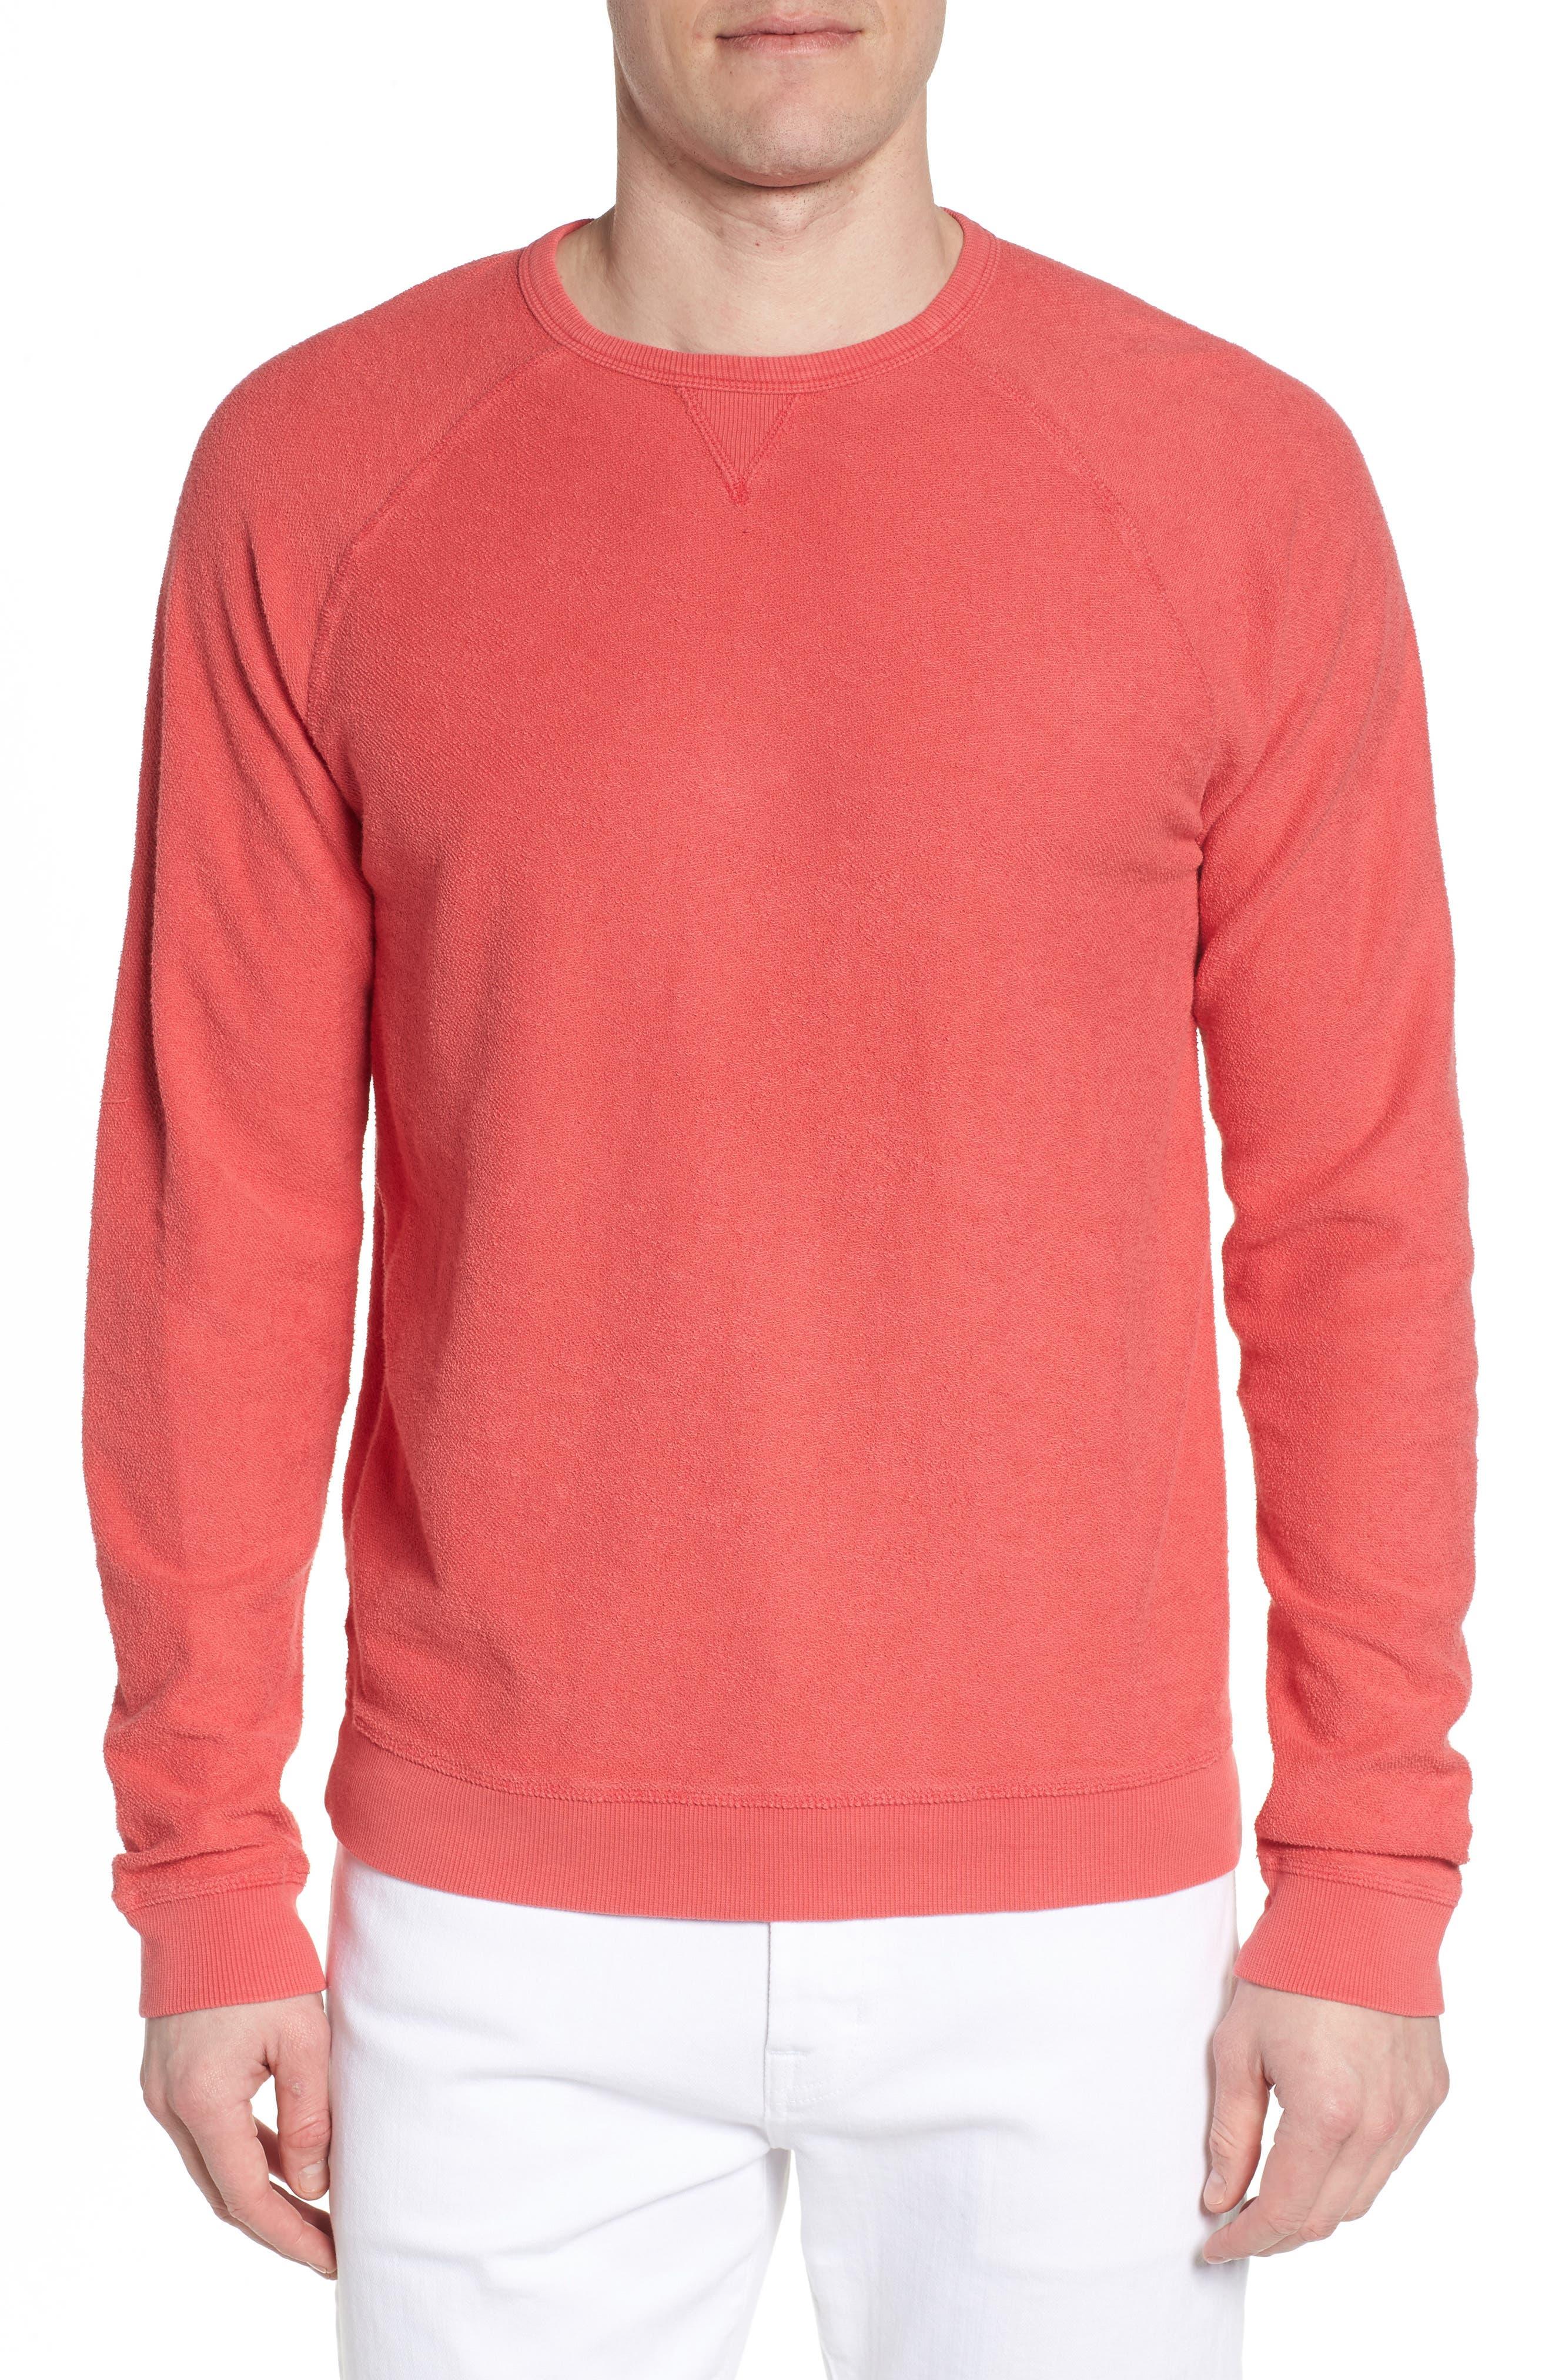 Mason Regular Fit Sweatshirt,                         Main,                         color, Malibu Red